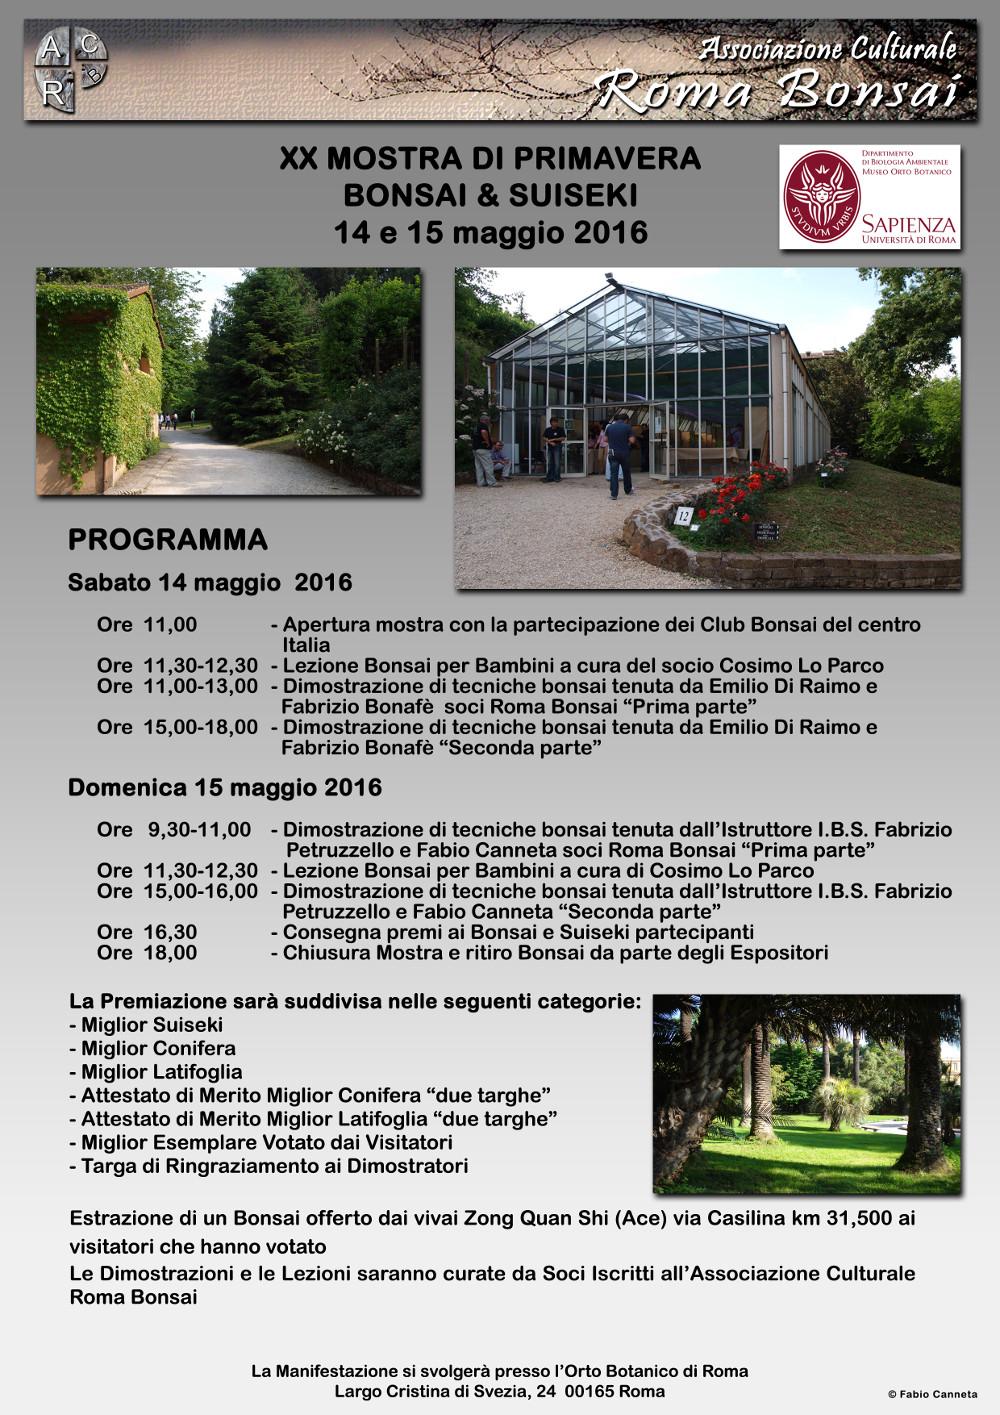 Mostra bonsai a roma orto botanico 2016 for Mostre roma 2016